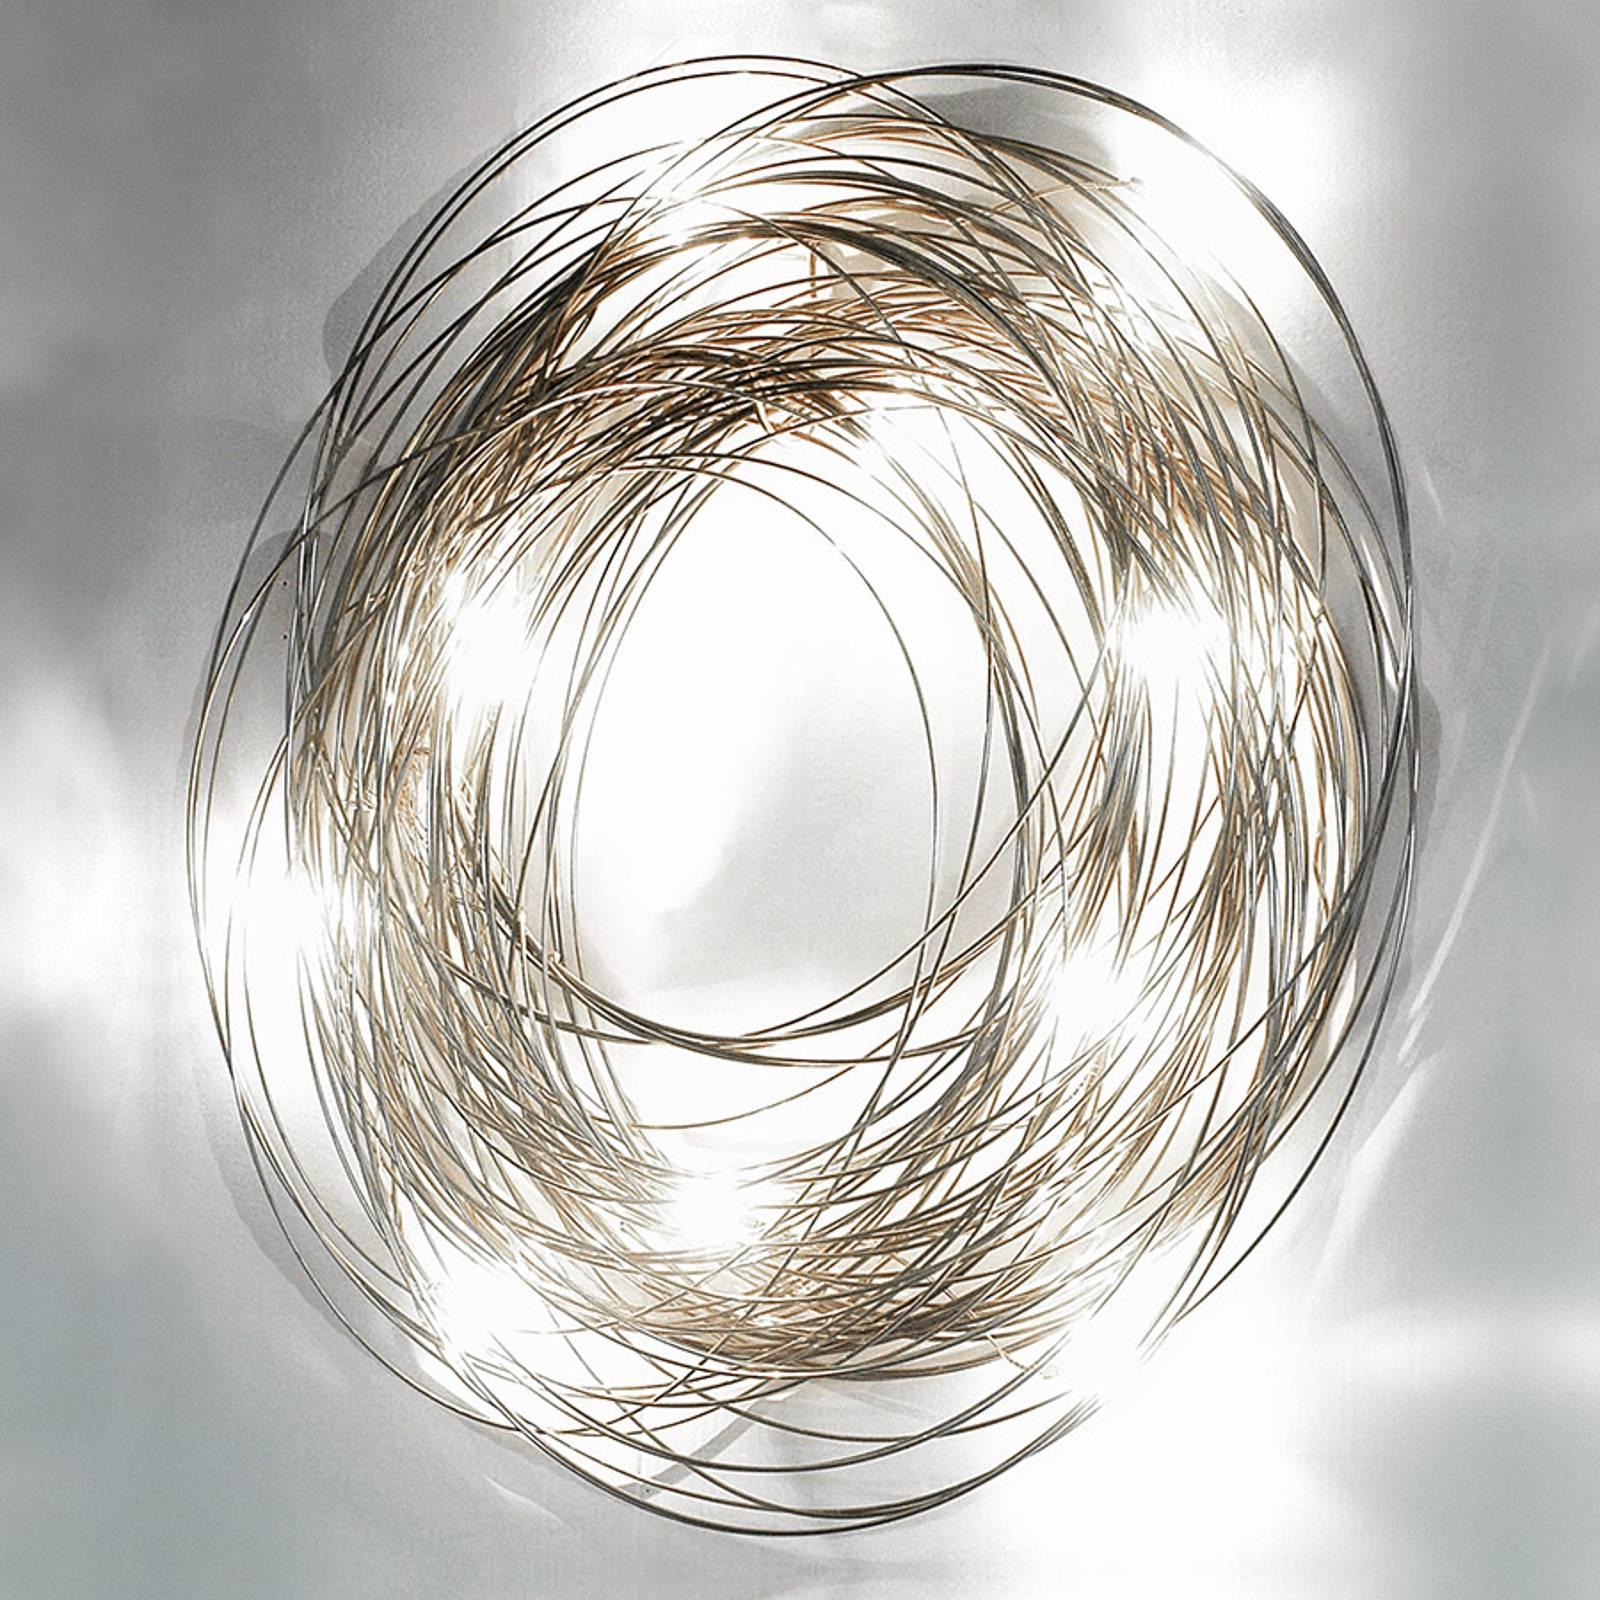 Geraffineerde wandlamp Confusione, 50 cm